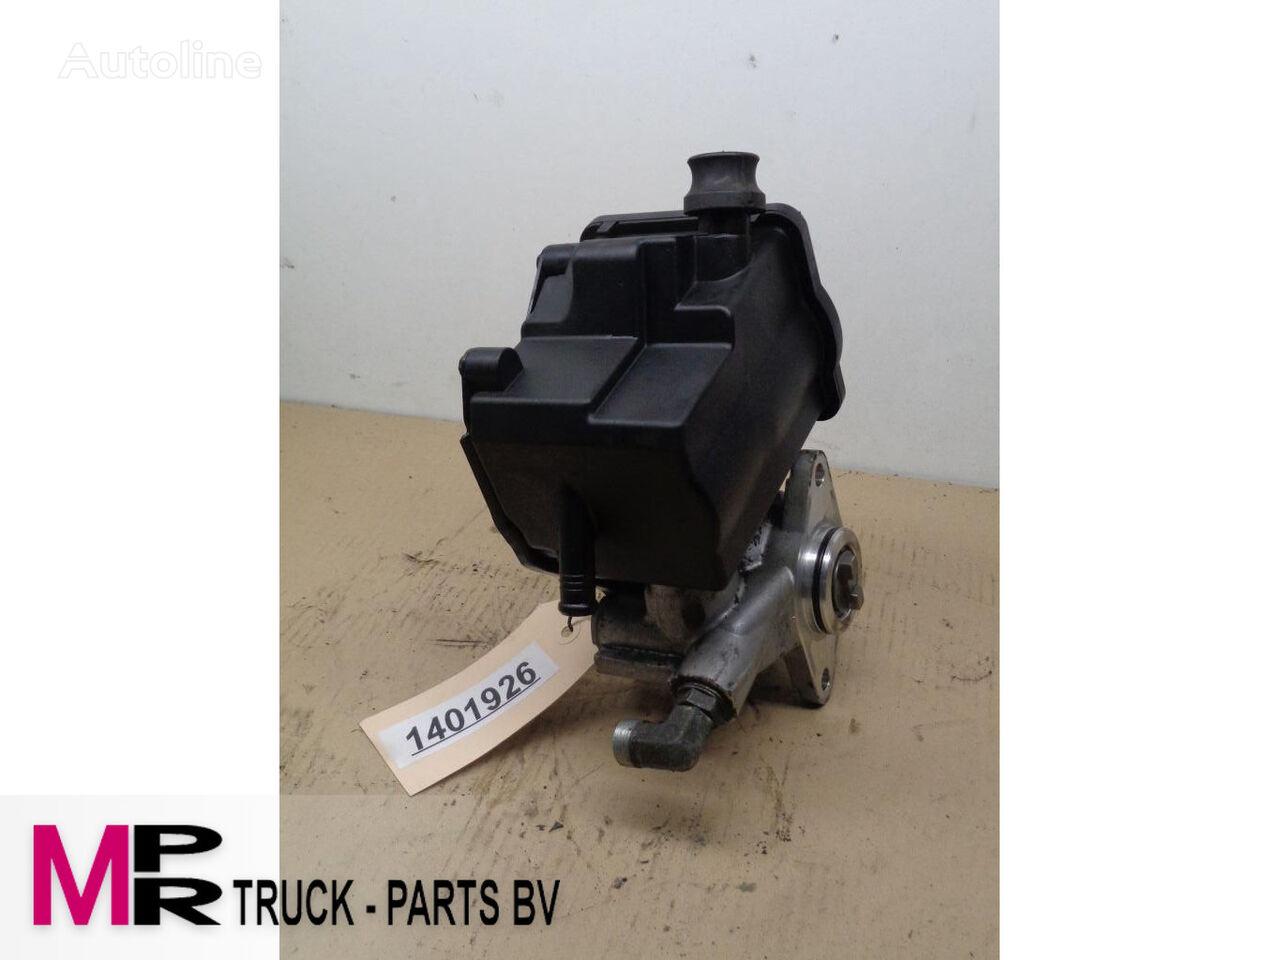 рулевой редуктор DAF 1401926 - 7685 900 104 (1401926) для грузовика Daf LF